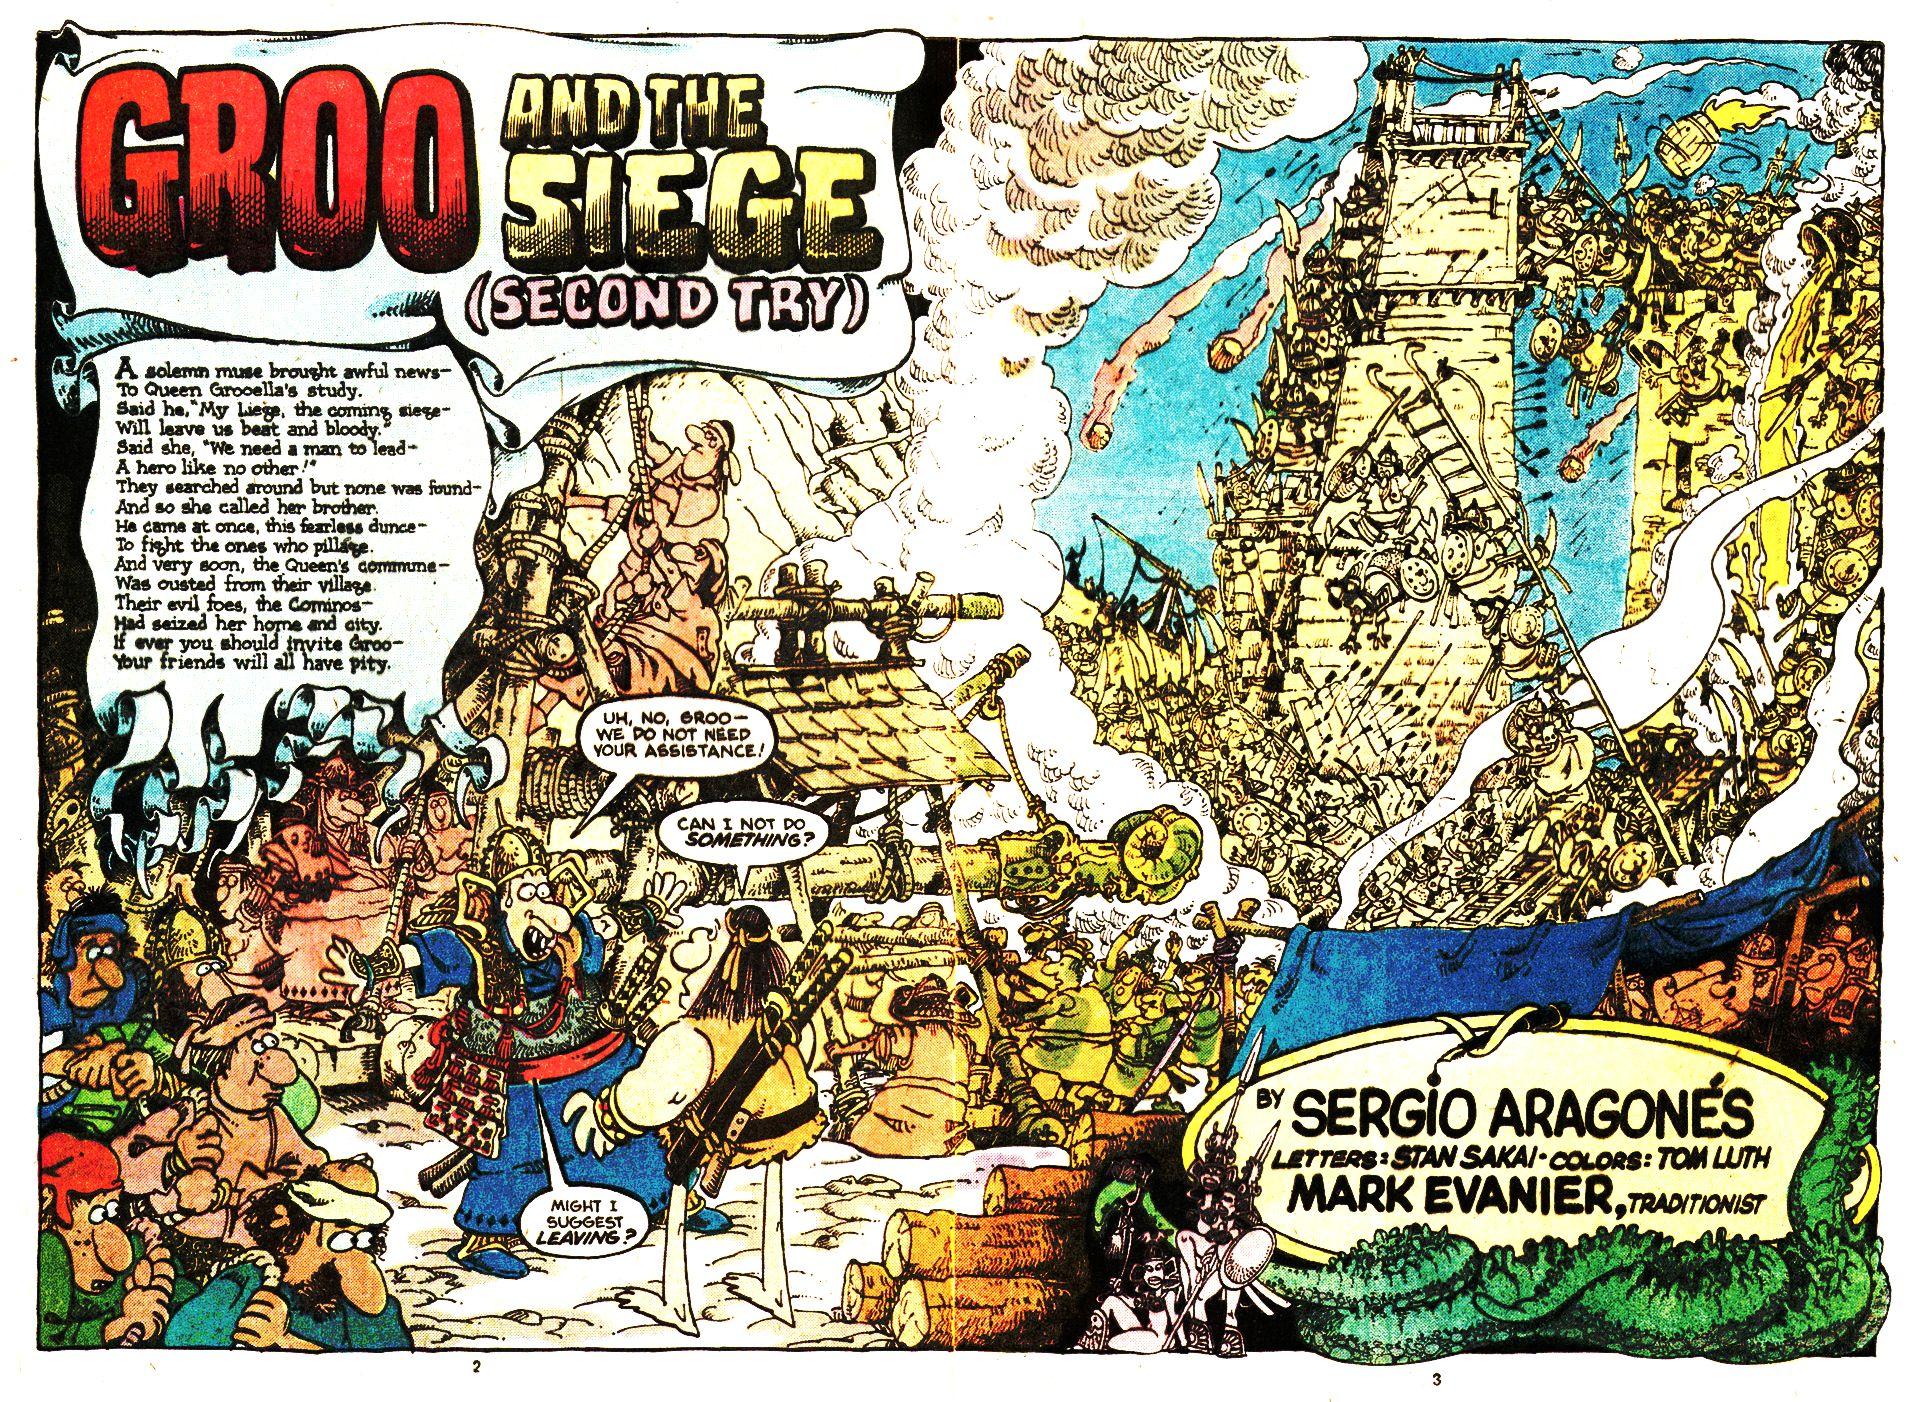 Read online Sergio Aragonés Groo the Wanderer comic -  Issue #20 - 3